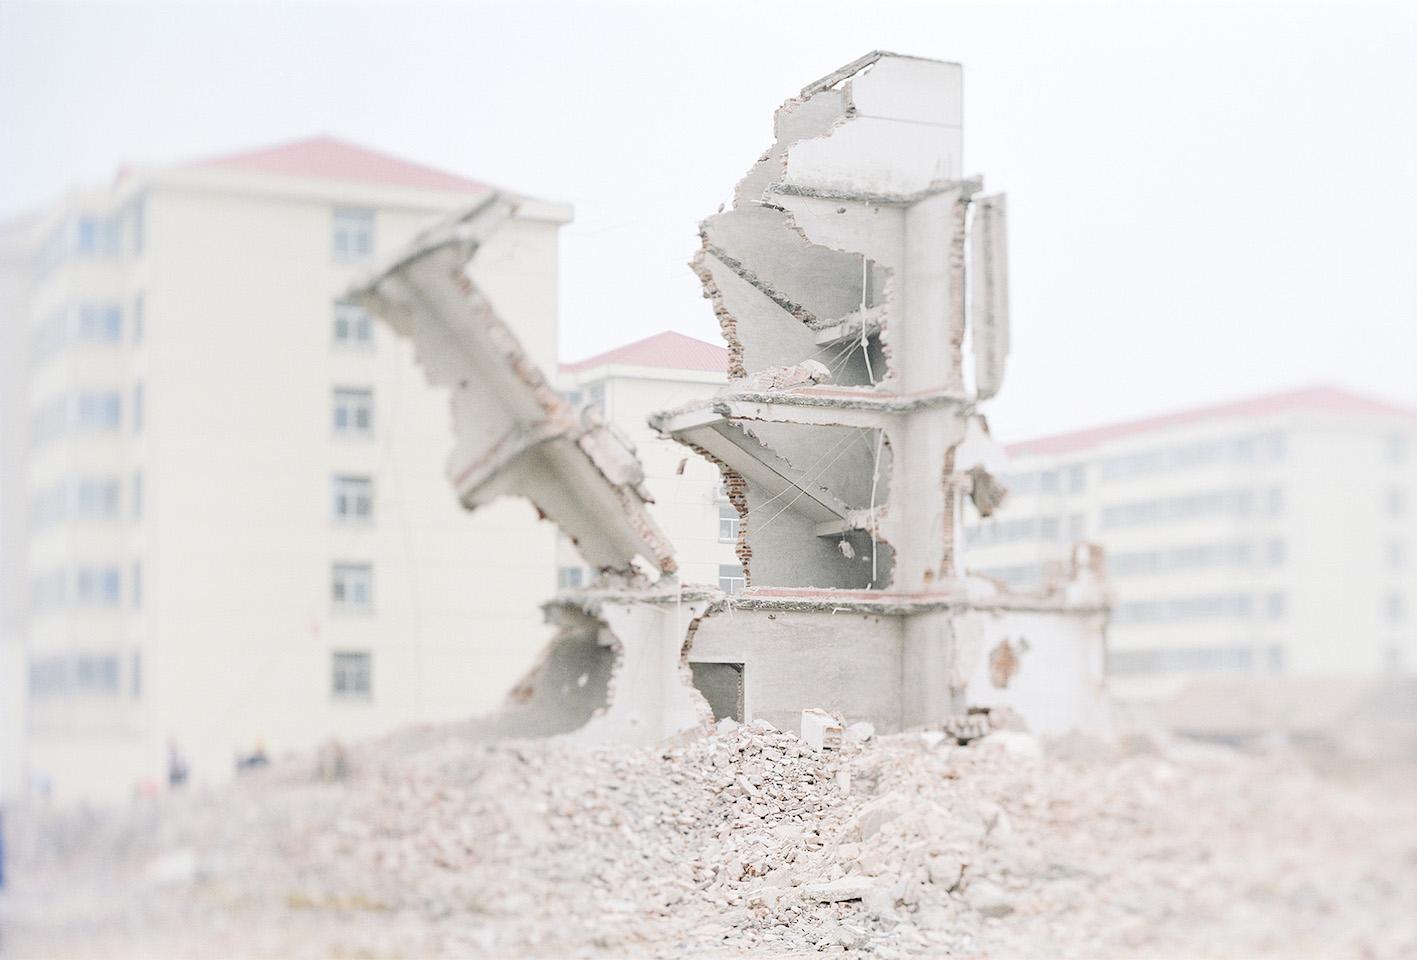 © Olivo Barbieri, Linyi, China, 2001.